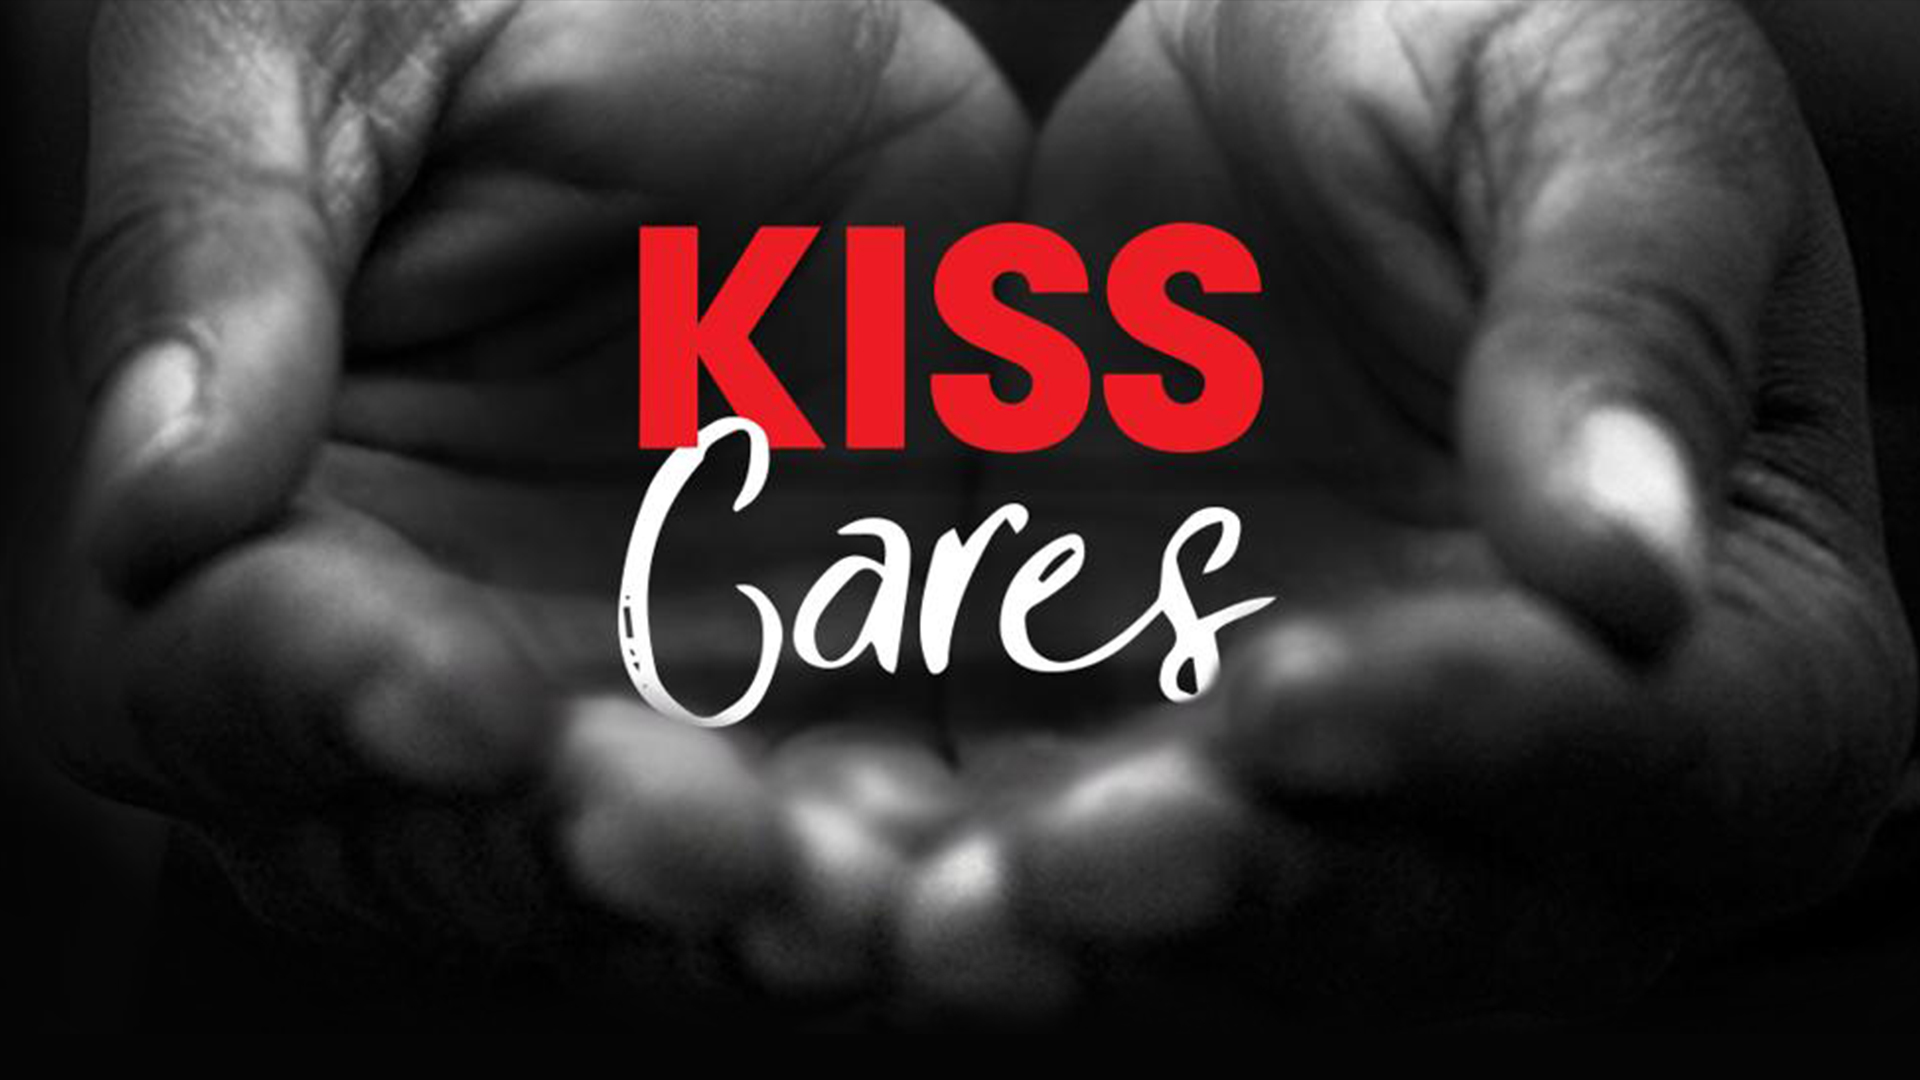 KISS 104.1's KISS Cares